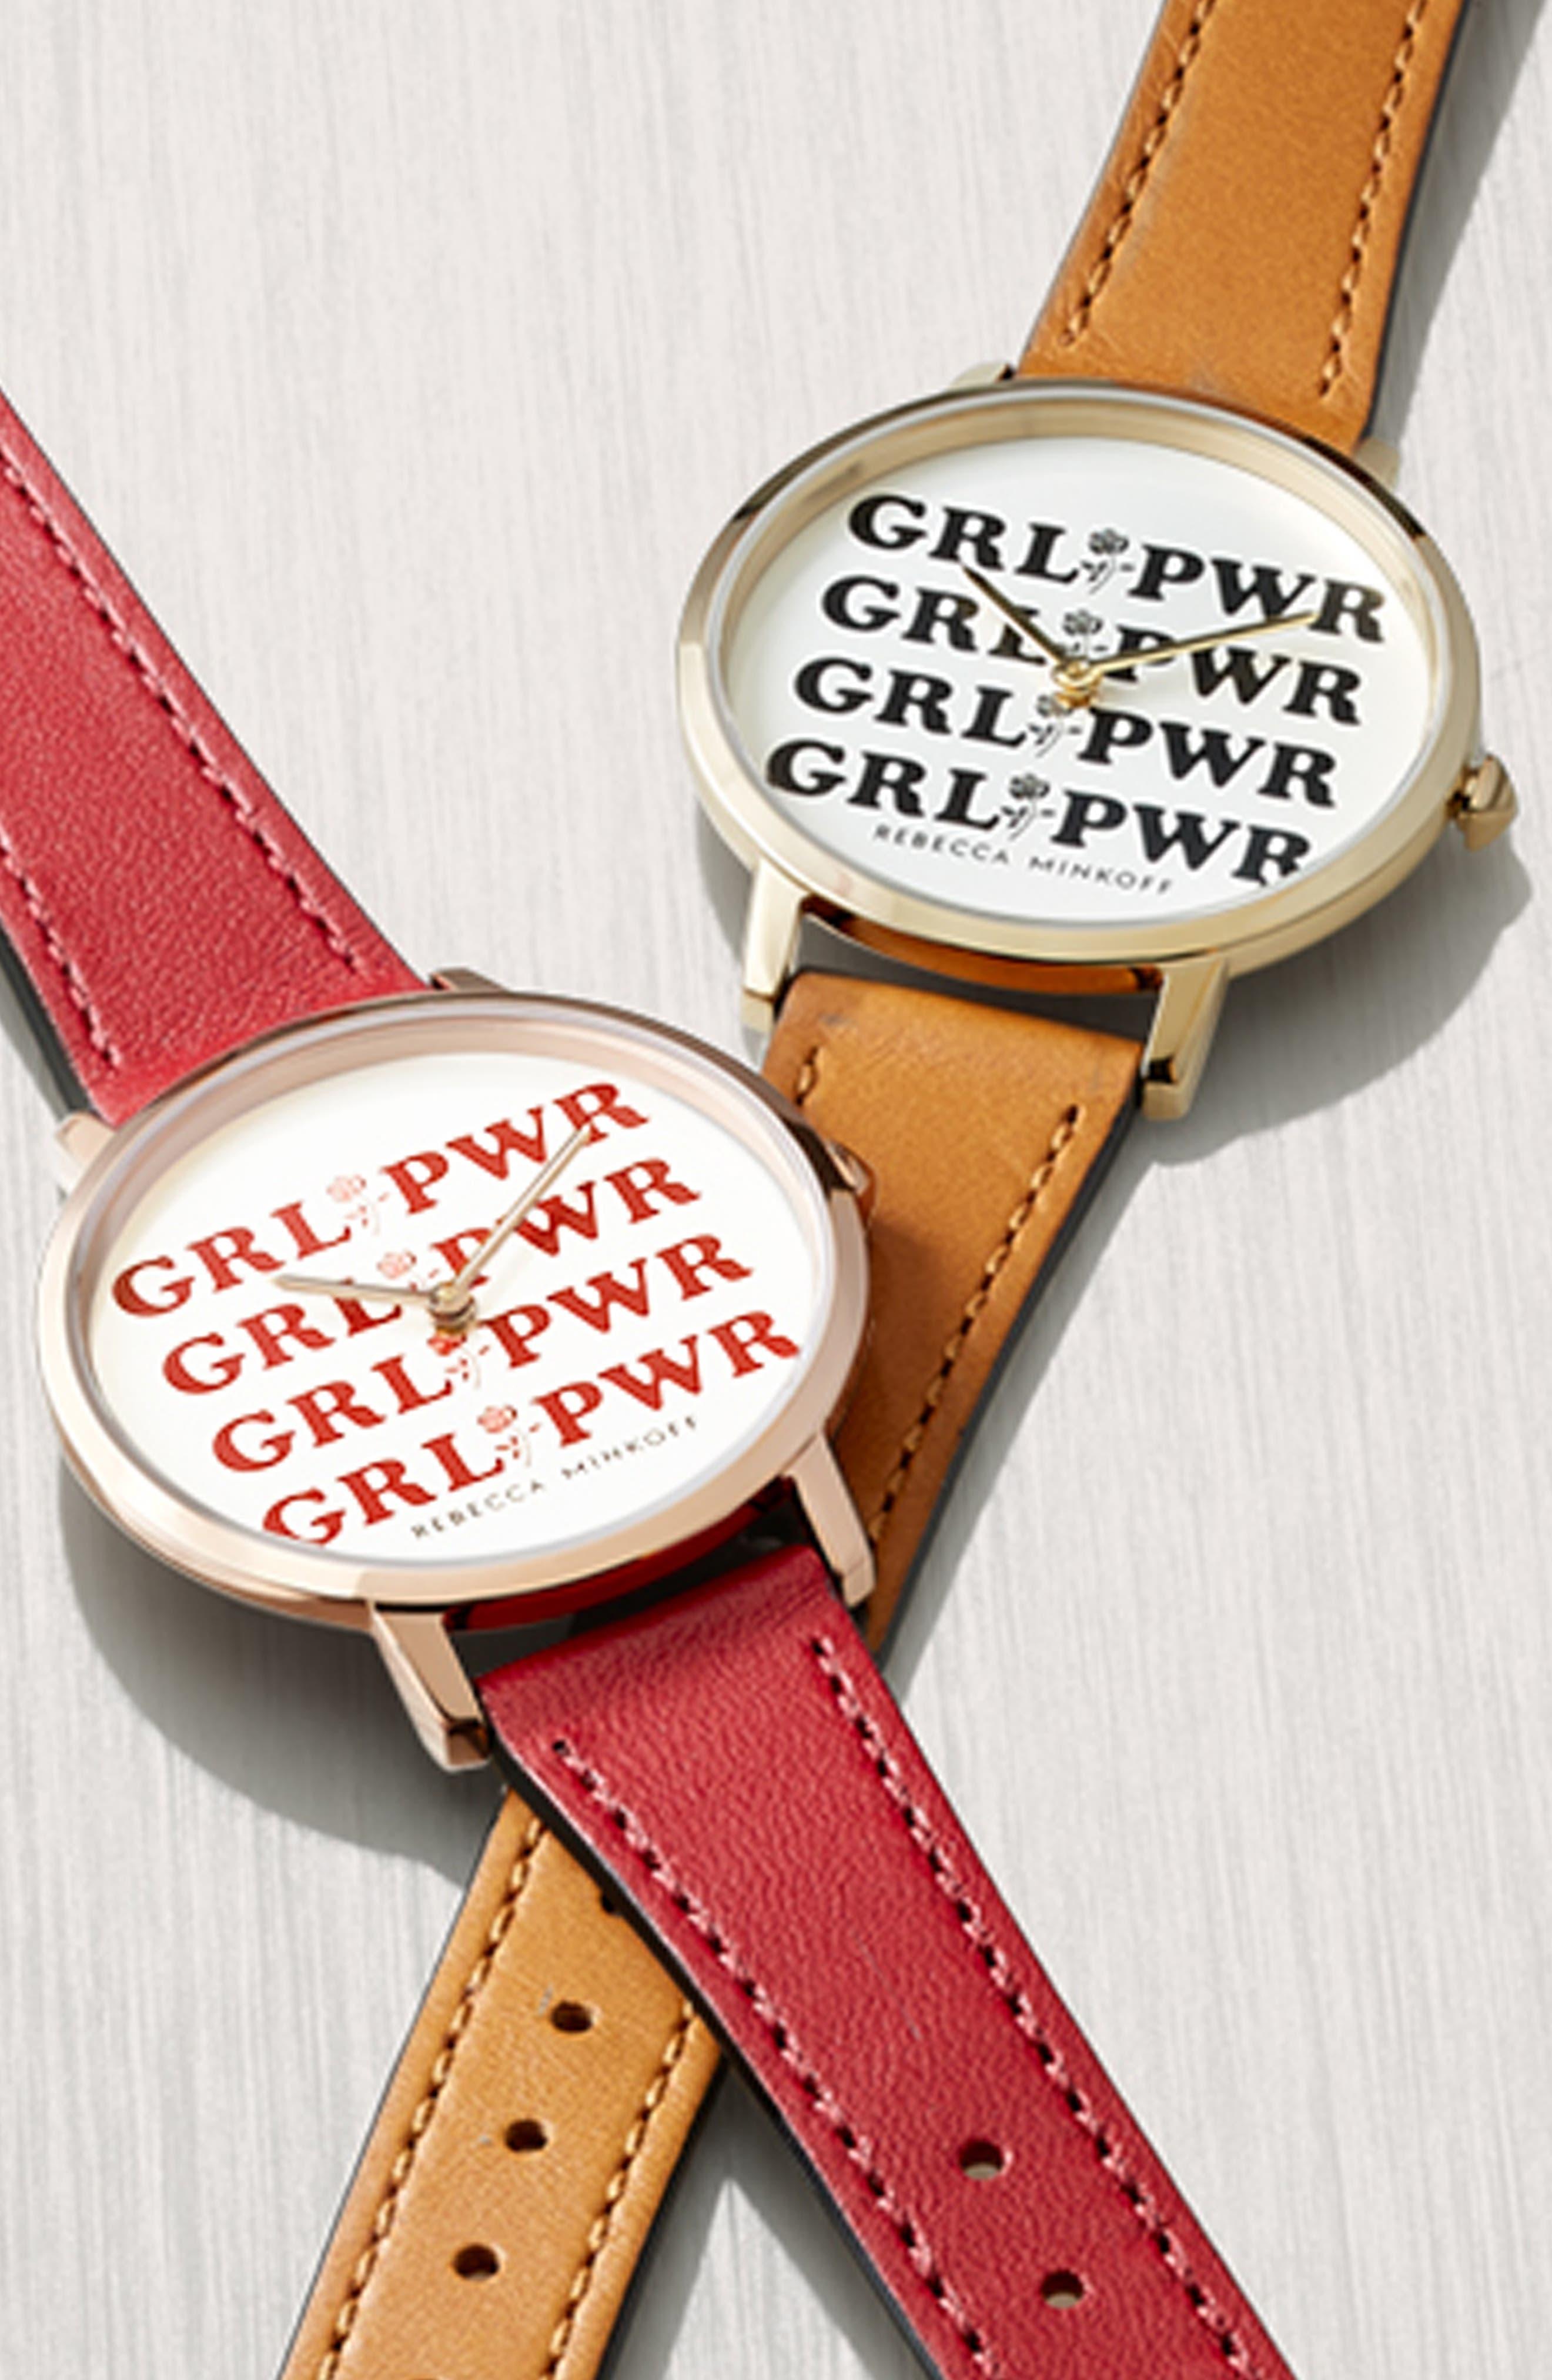 REBECCA MINKOFF,                             Rebeca Minkoff Major GRL PWR Leather Strap Watch, 35mm,                             Alternate thumbnail 4, color,                             200